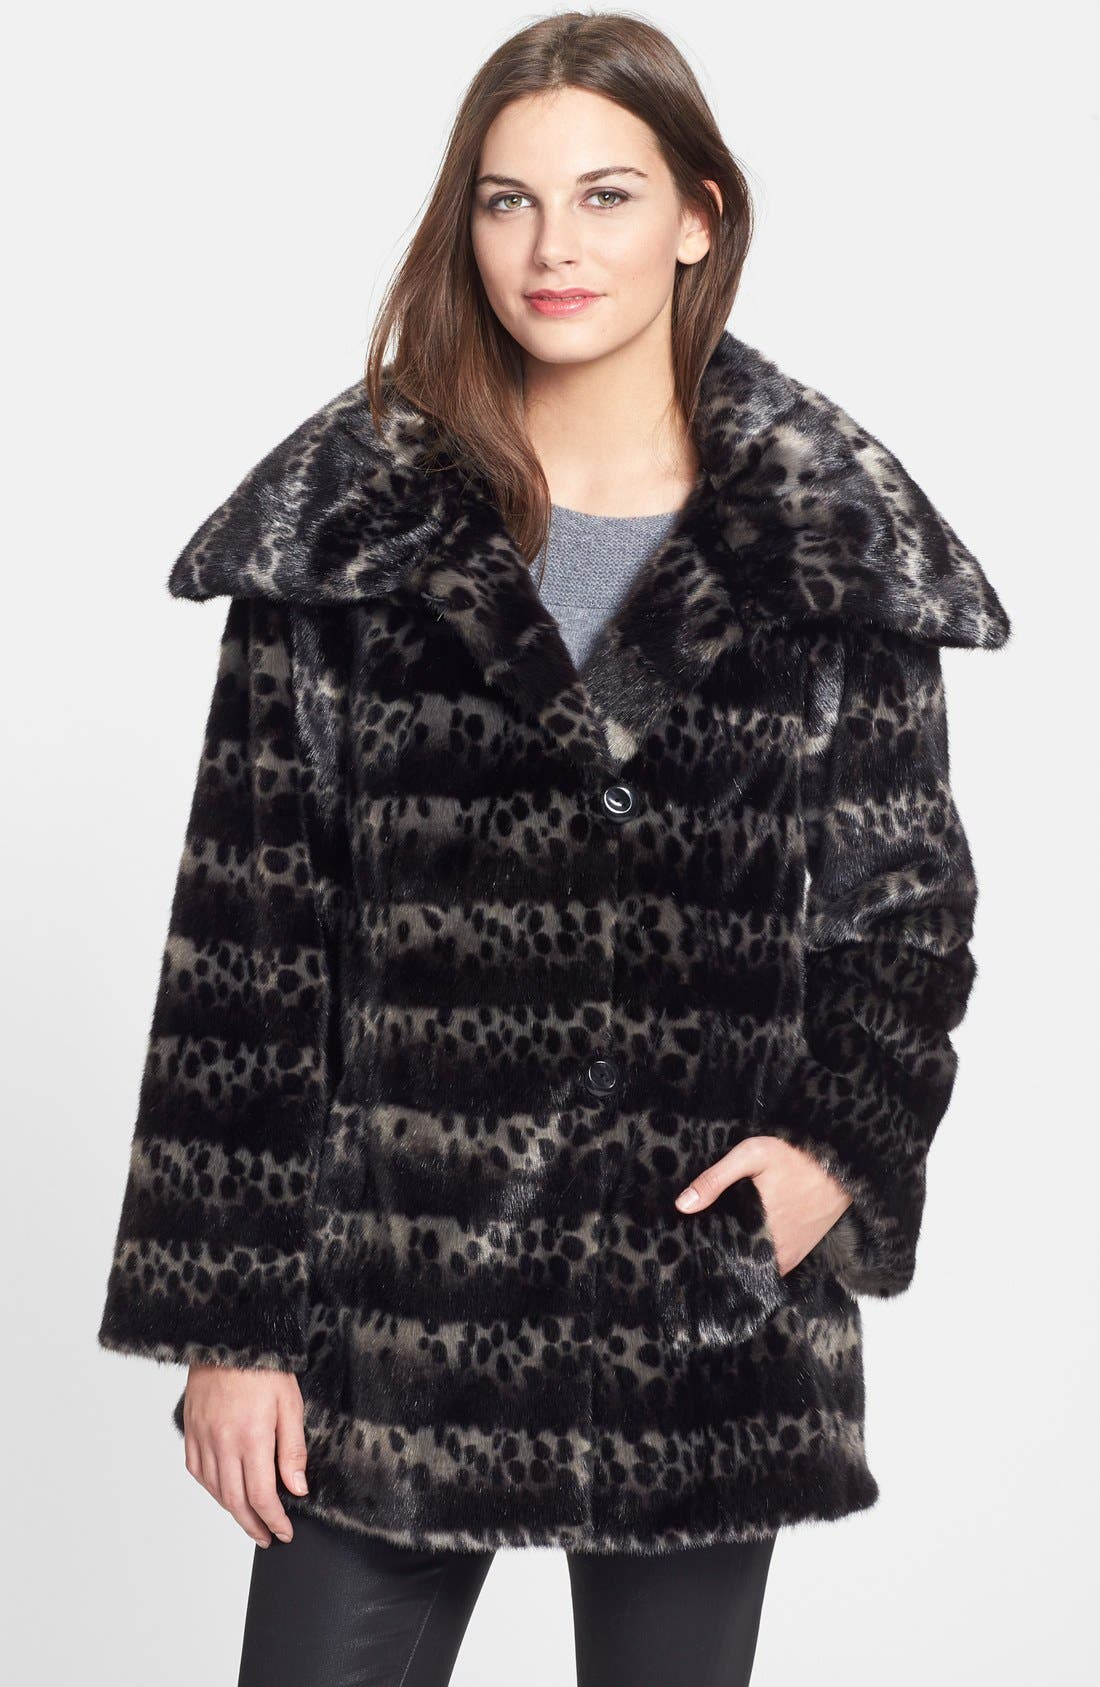 Alternate Image 1 Selected - Gallery Ombré Faux Fur Coat (Regular & Petite) (Online Only)